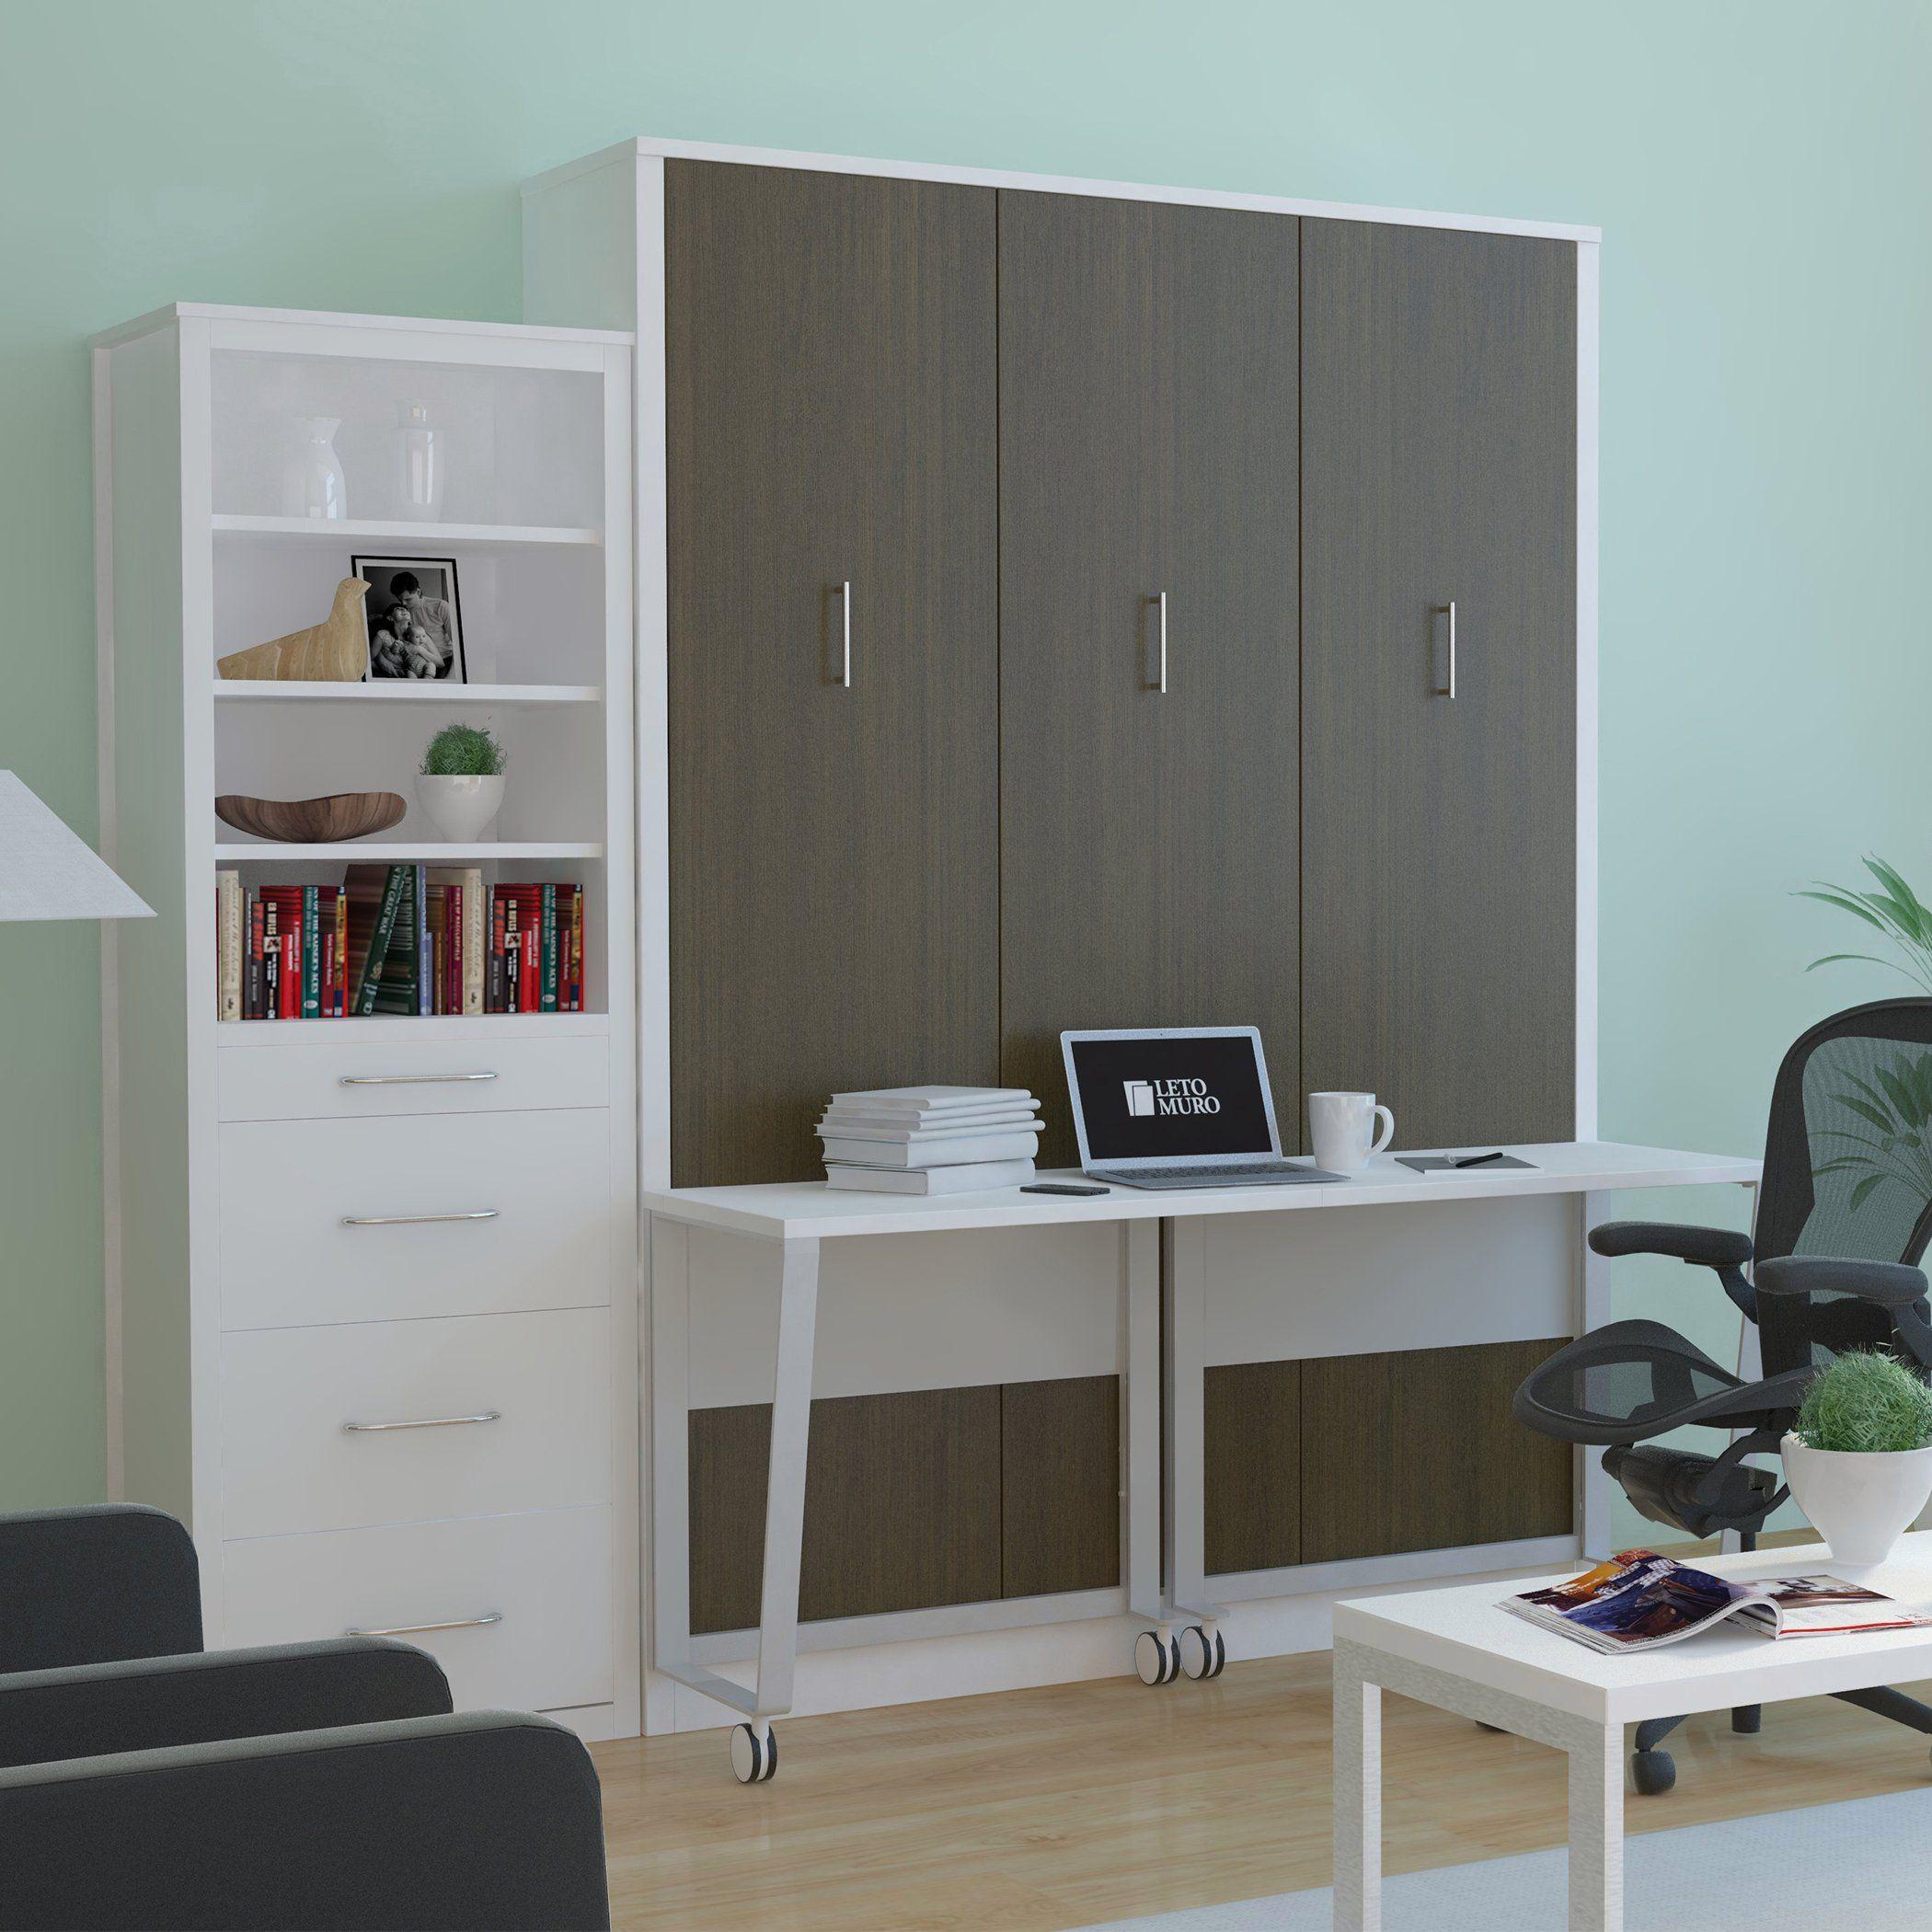 Best Vertical Queen Size Murphy Beds For Sale Online Furniture 400 x 300